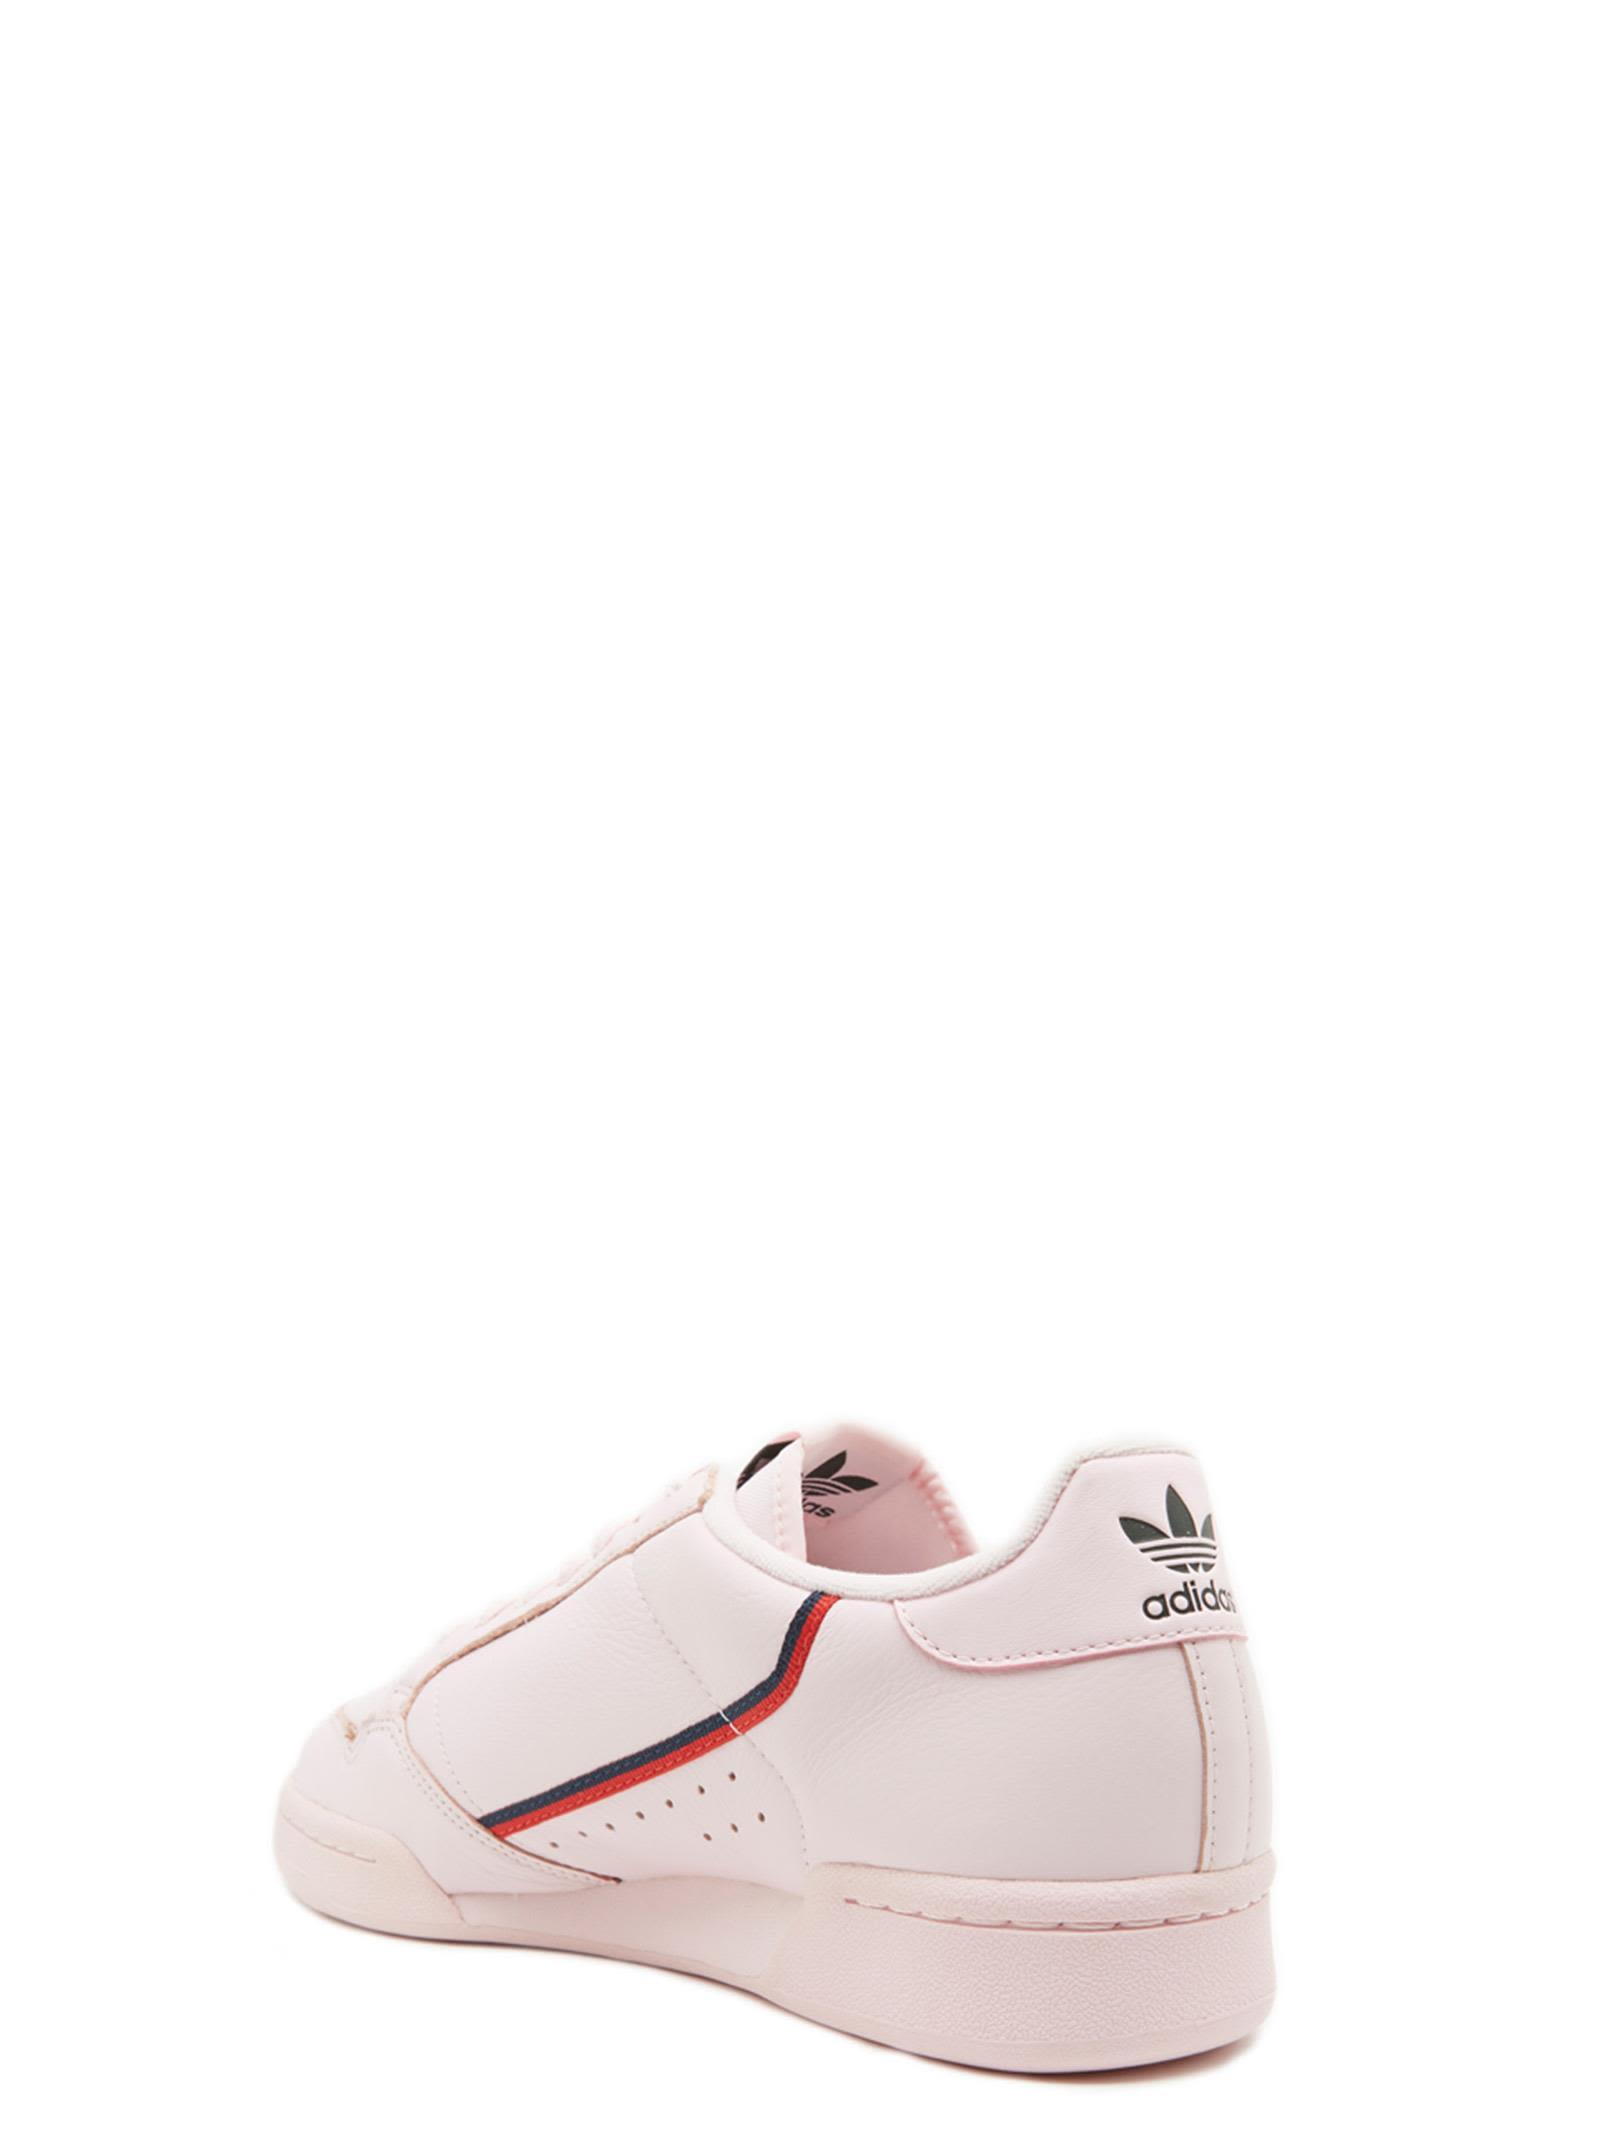 Adidas Originals Adidas Originals Continental 80 Shoes Pink